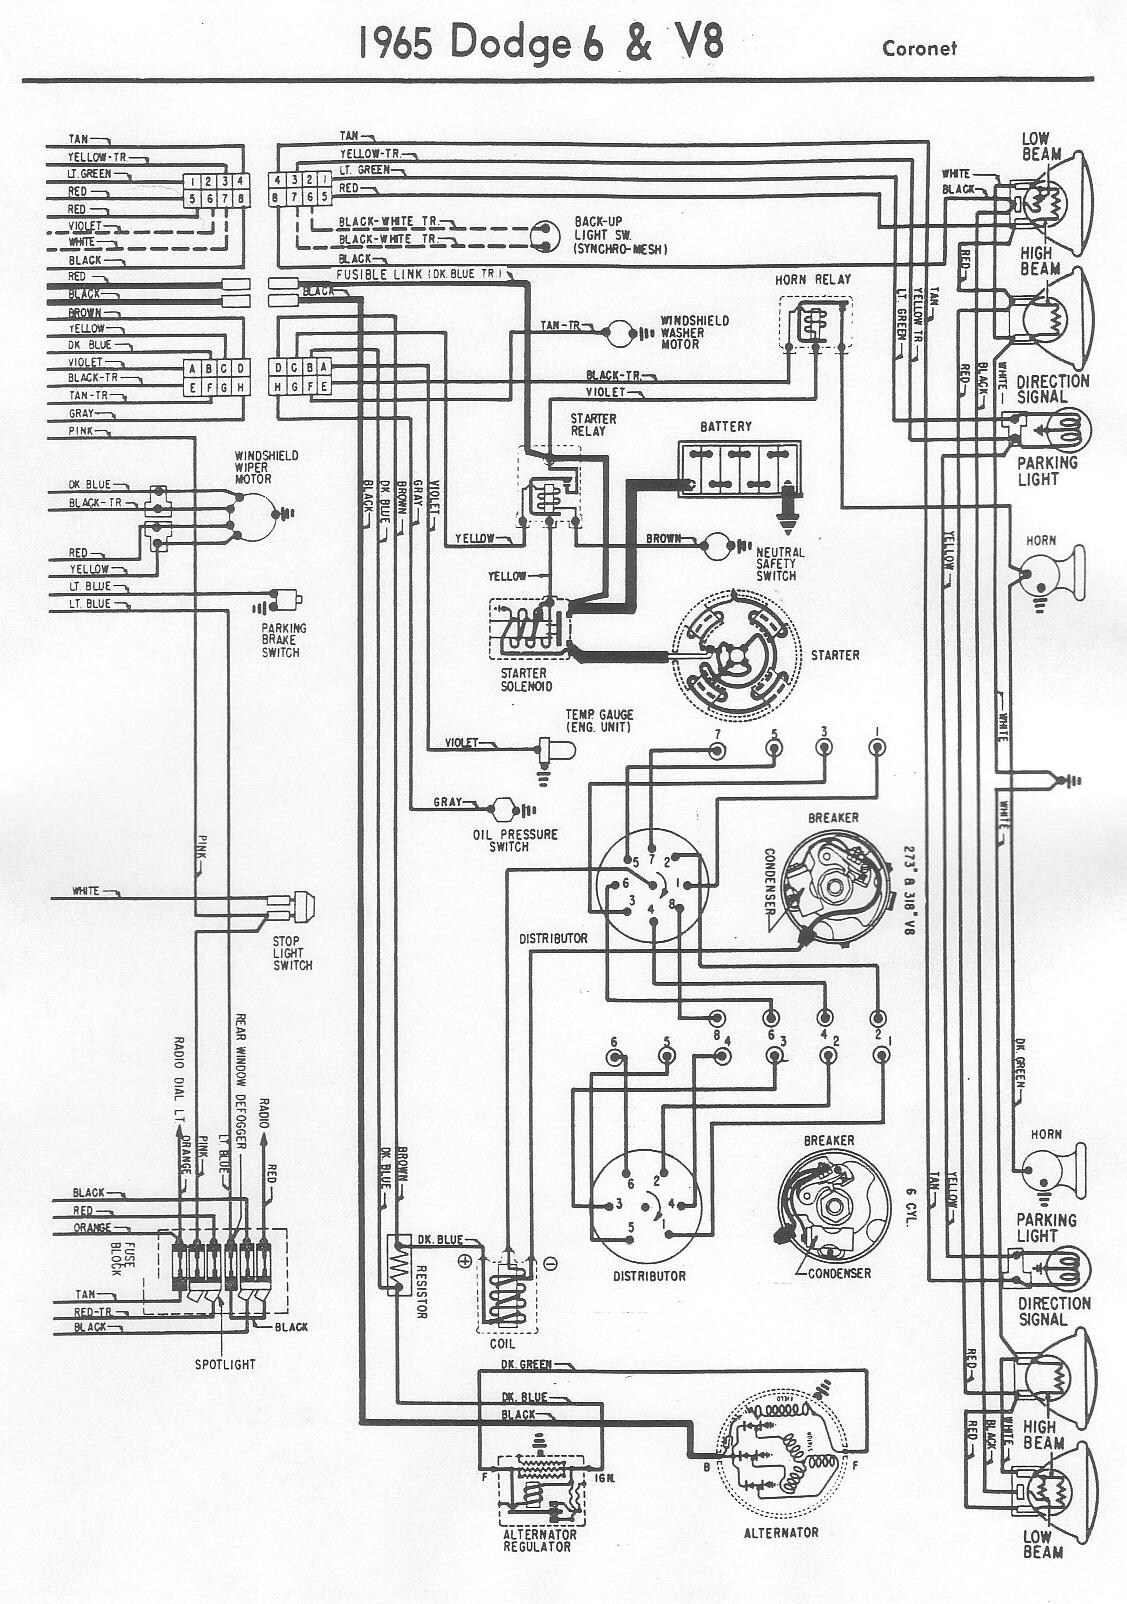 1966 dodge wiring diagram wiring diagram blogs 2012 dodge charger pcm wiring diagram 1966 dodge wiring [ 1127 x 1604 Pixel ]